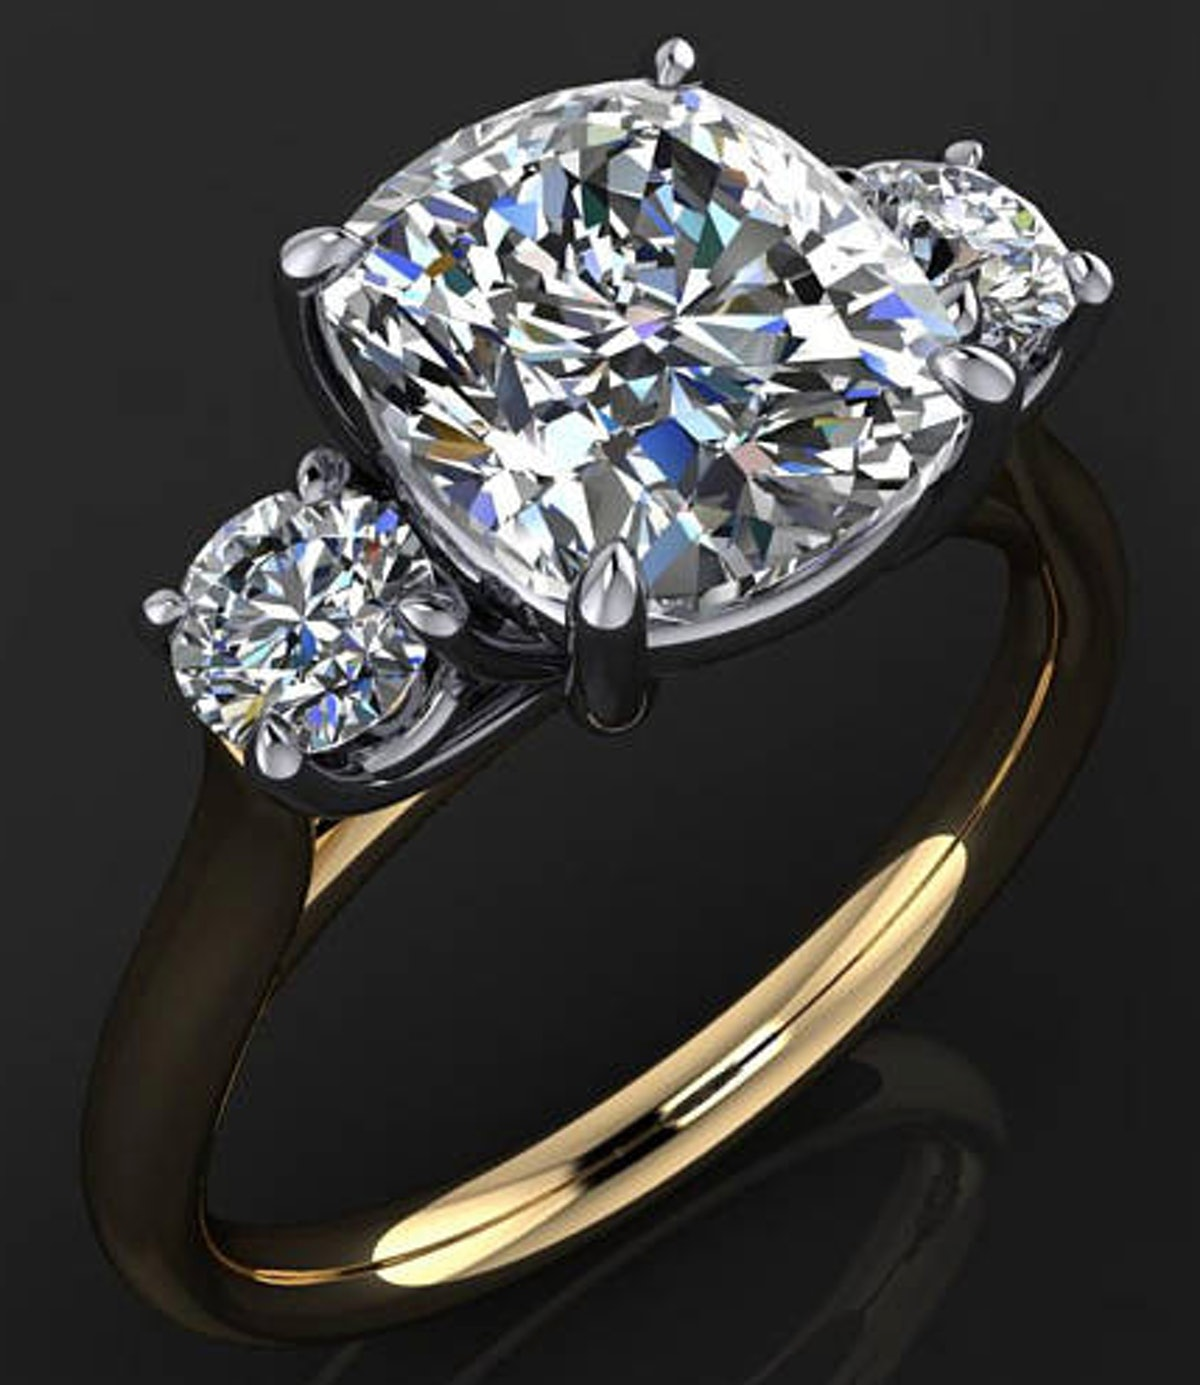 Meghan Ring — 2.5 Carat Cushion Cut ZAYA Moissanite Engagement Ring